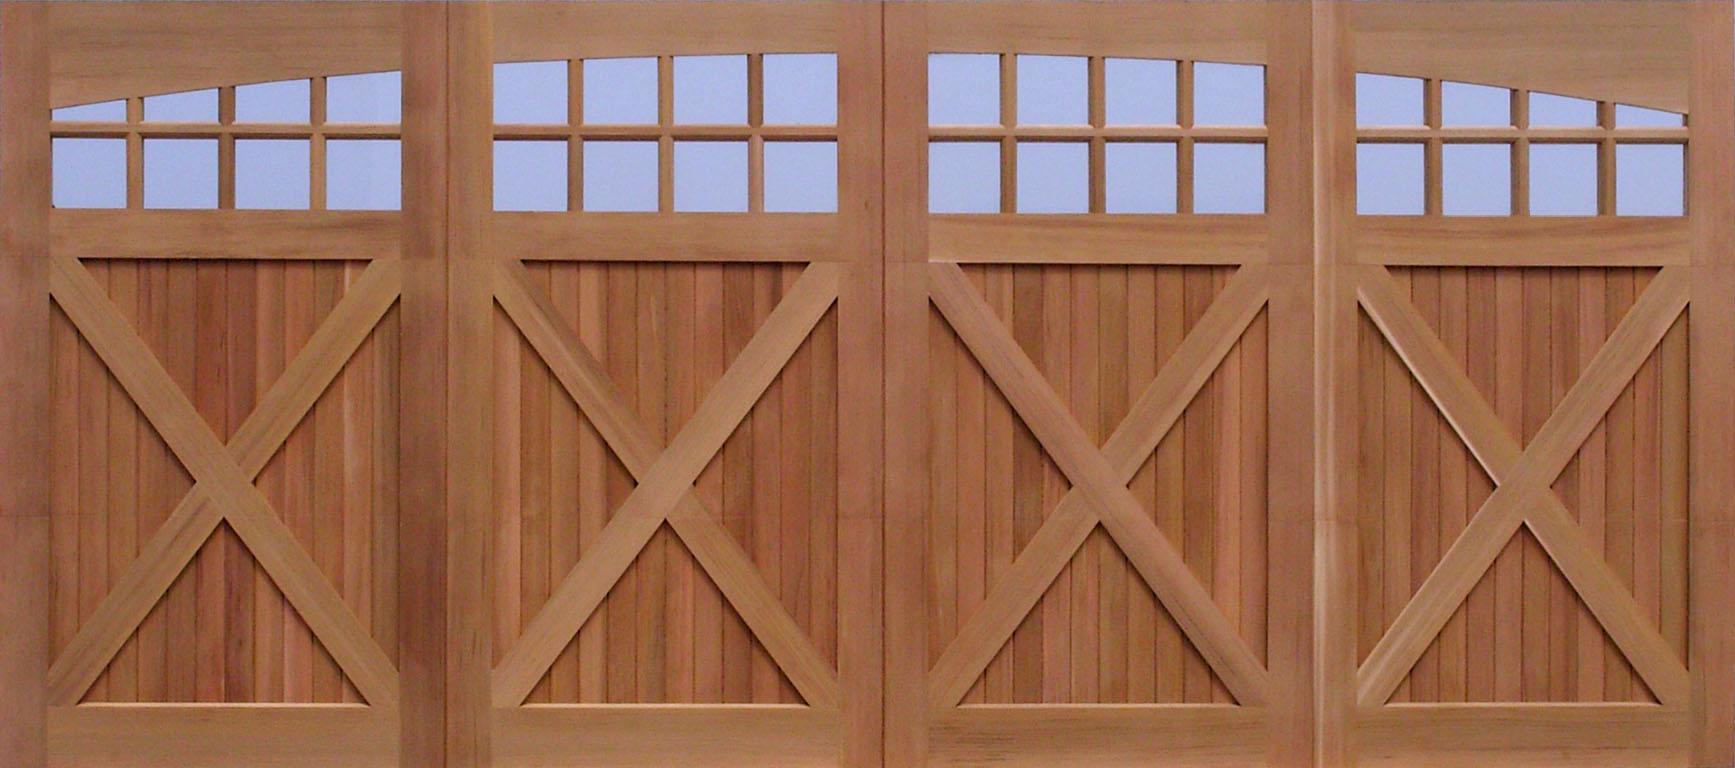 Attrayant Wood Garage Doors